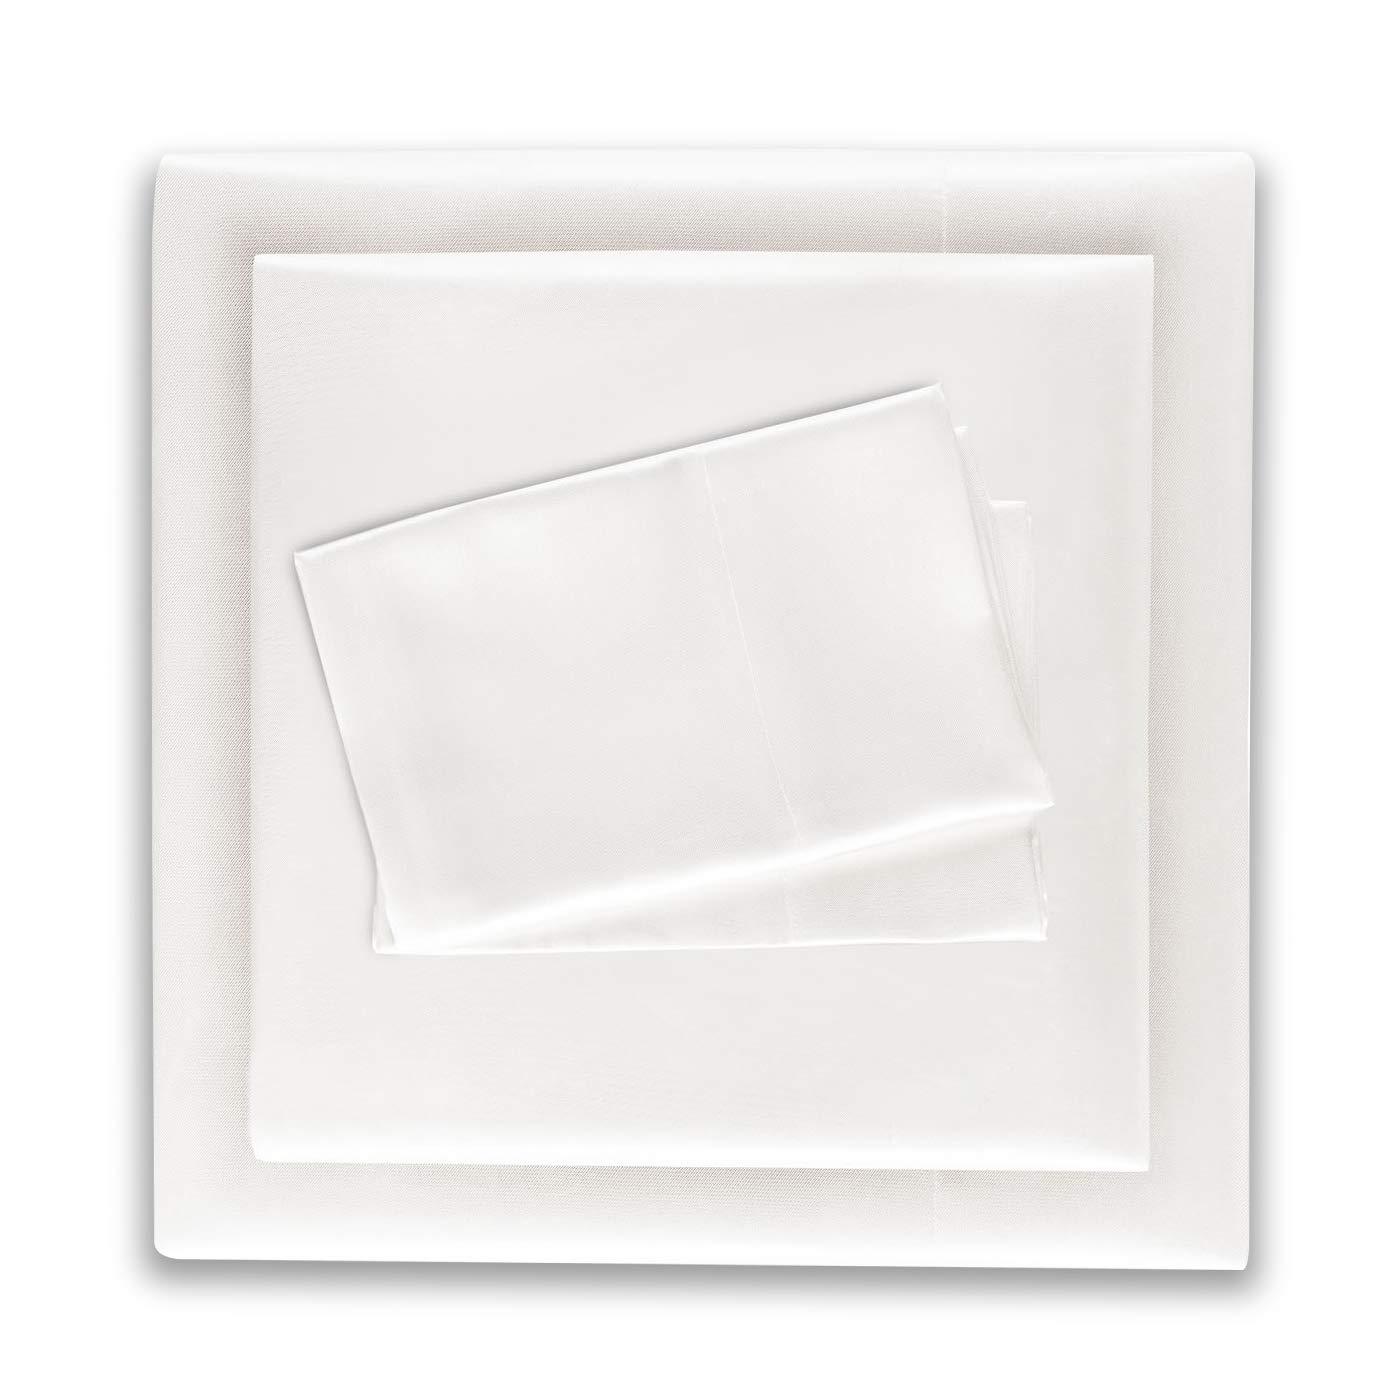 Honeymoon Luxury Satin Bed Sheet Set, Ultra Silky Soft, Queen - White